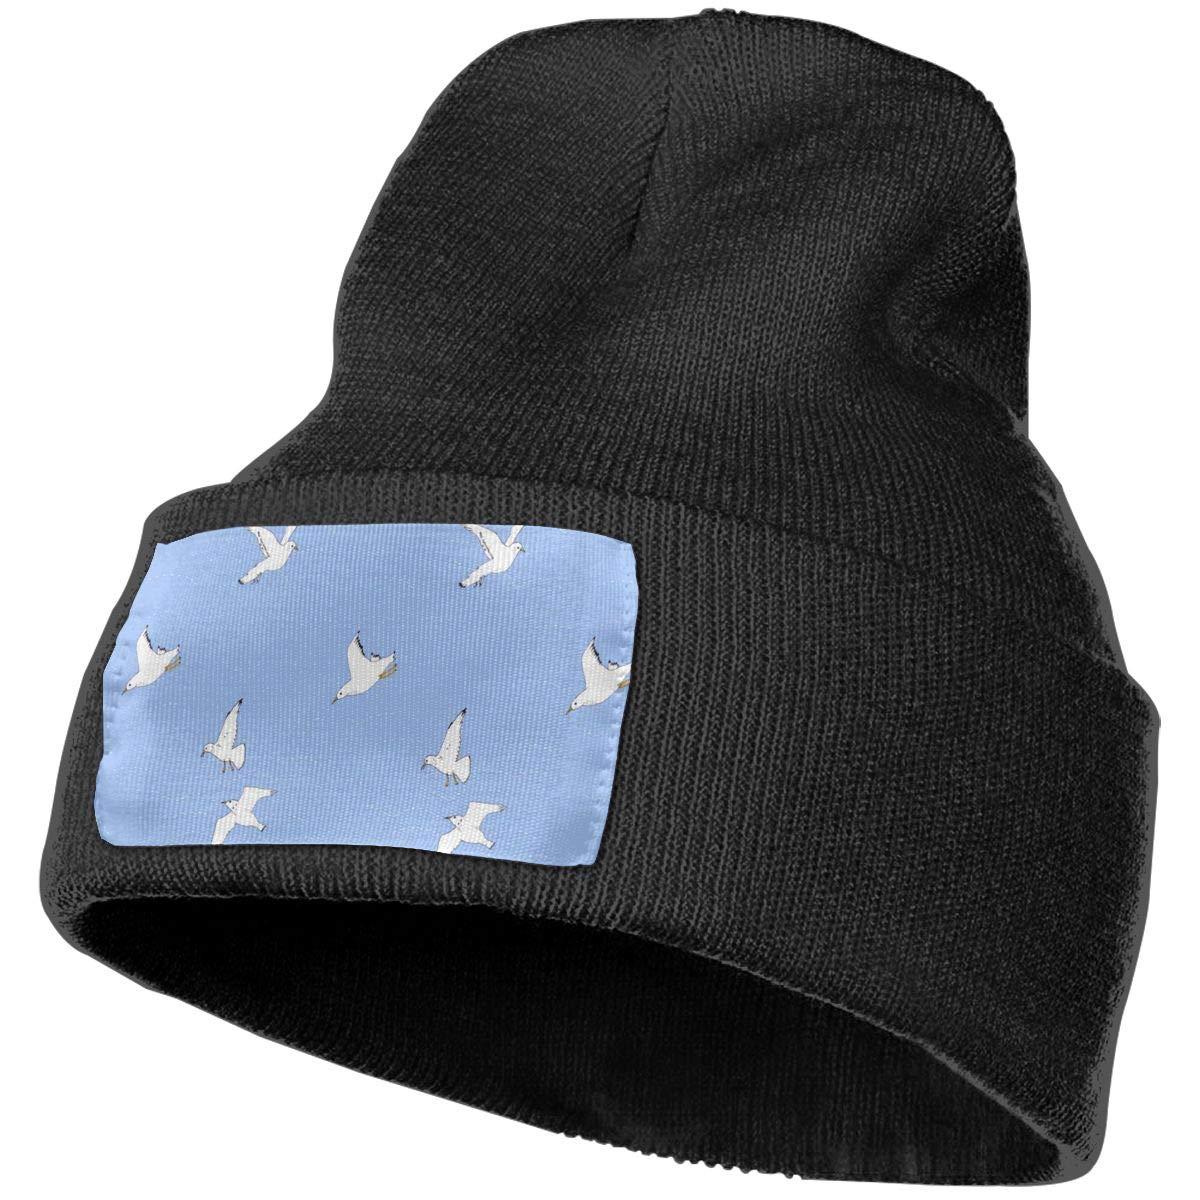 Field Rain Dove Unisex 100/% Acrylic Knit Hat Cap Rider Soft Beanie Hat Woolen Hat